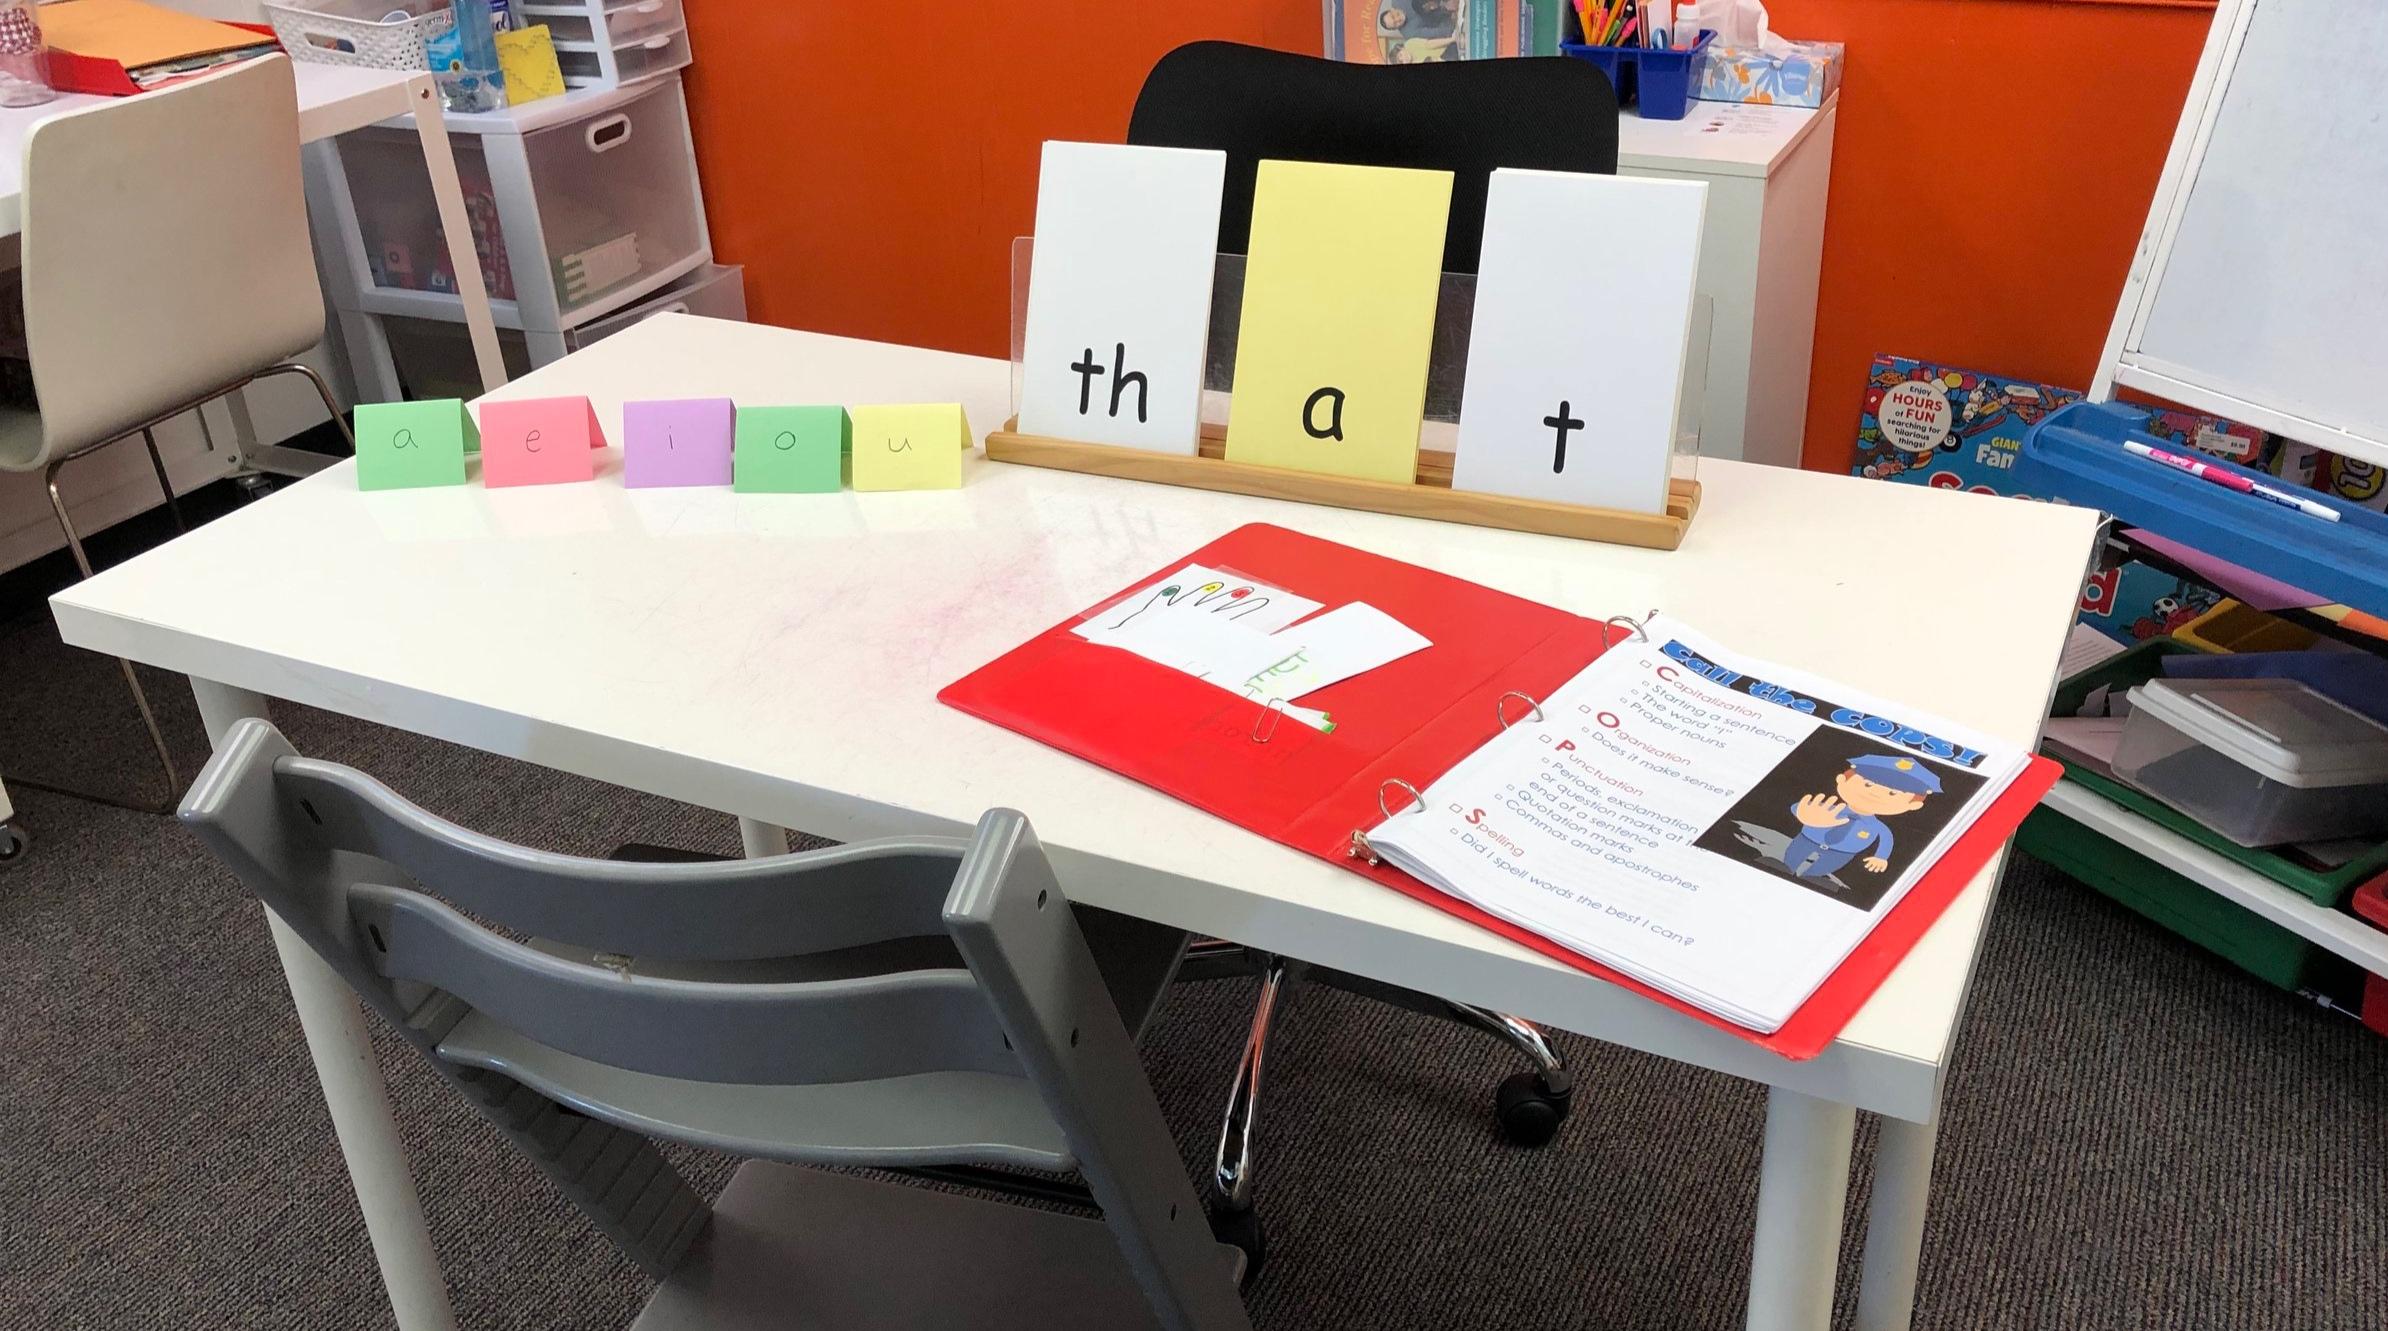 - Puzzle Piece offers dyslexia diagnosis and treatment utilizing the Orton-Gillingham multi sensory approach.